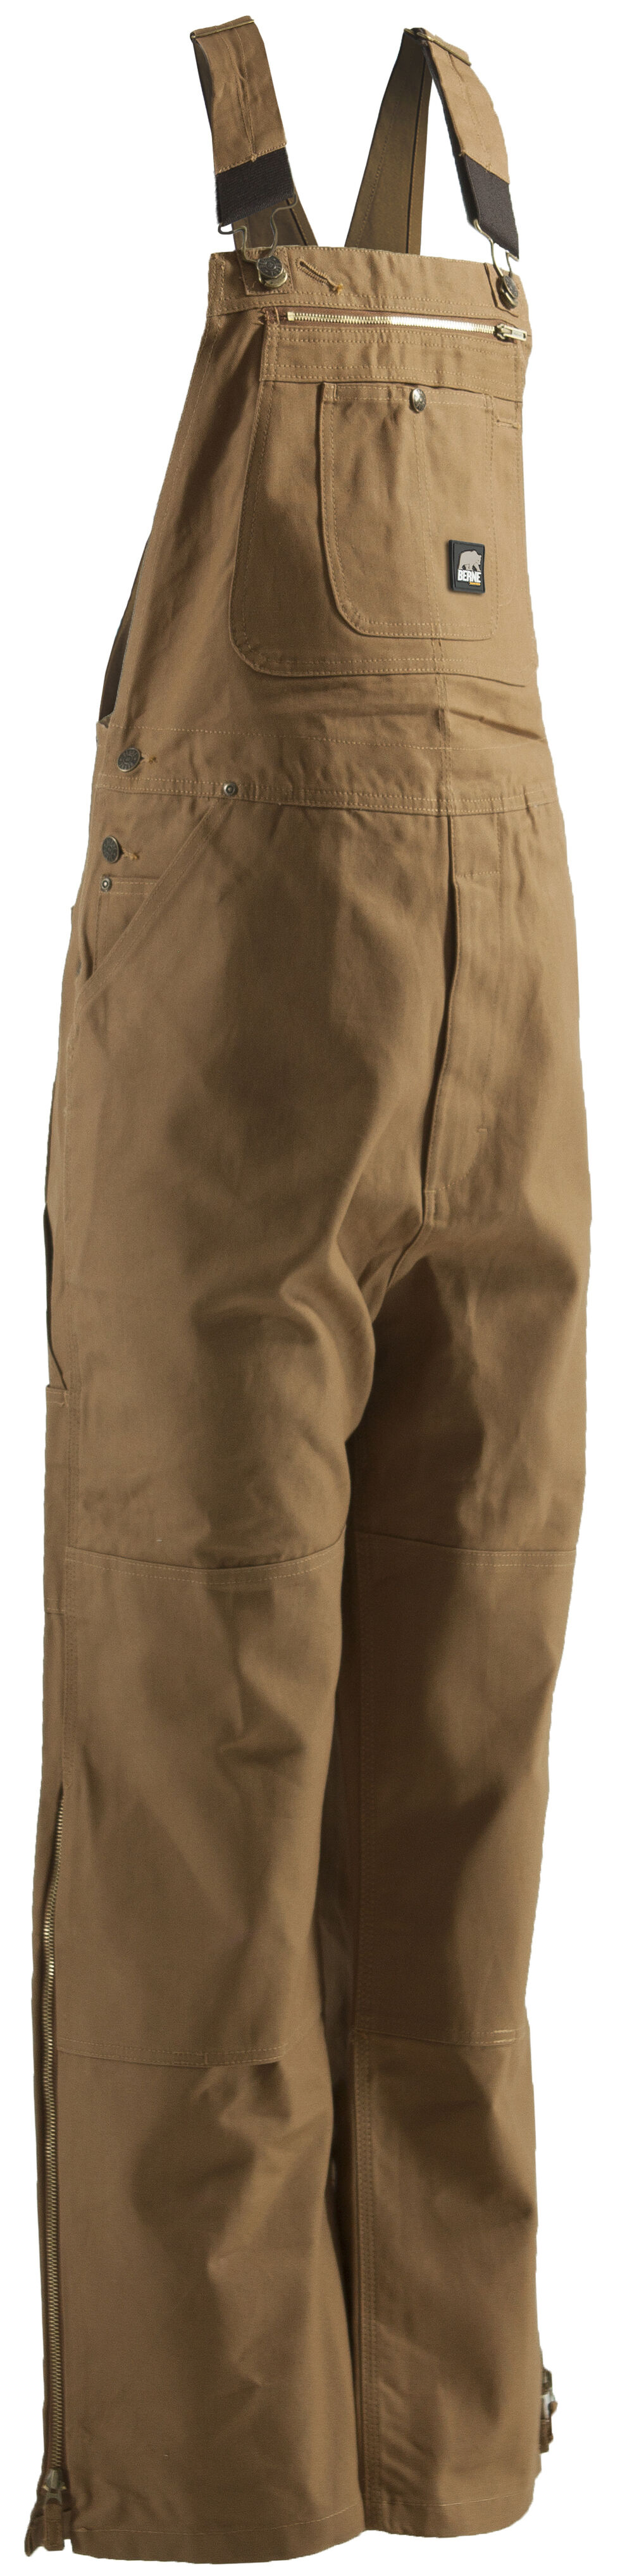 Berne Men's Original Unlined Duck Bib Overalls - BigX, Brown, hi-res